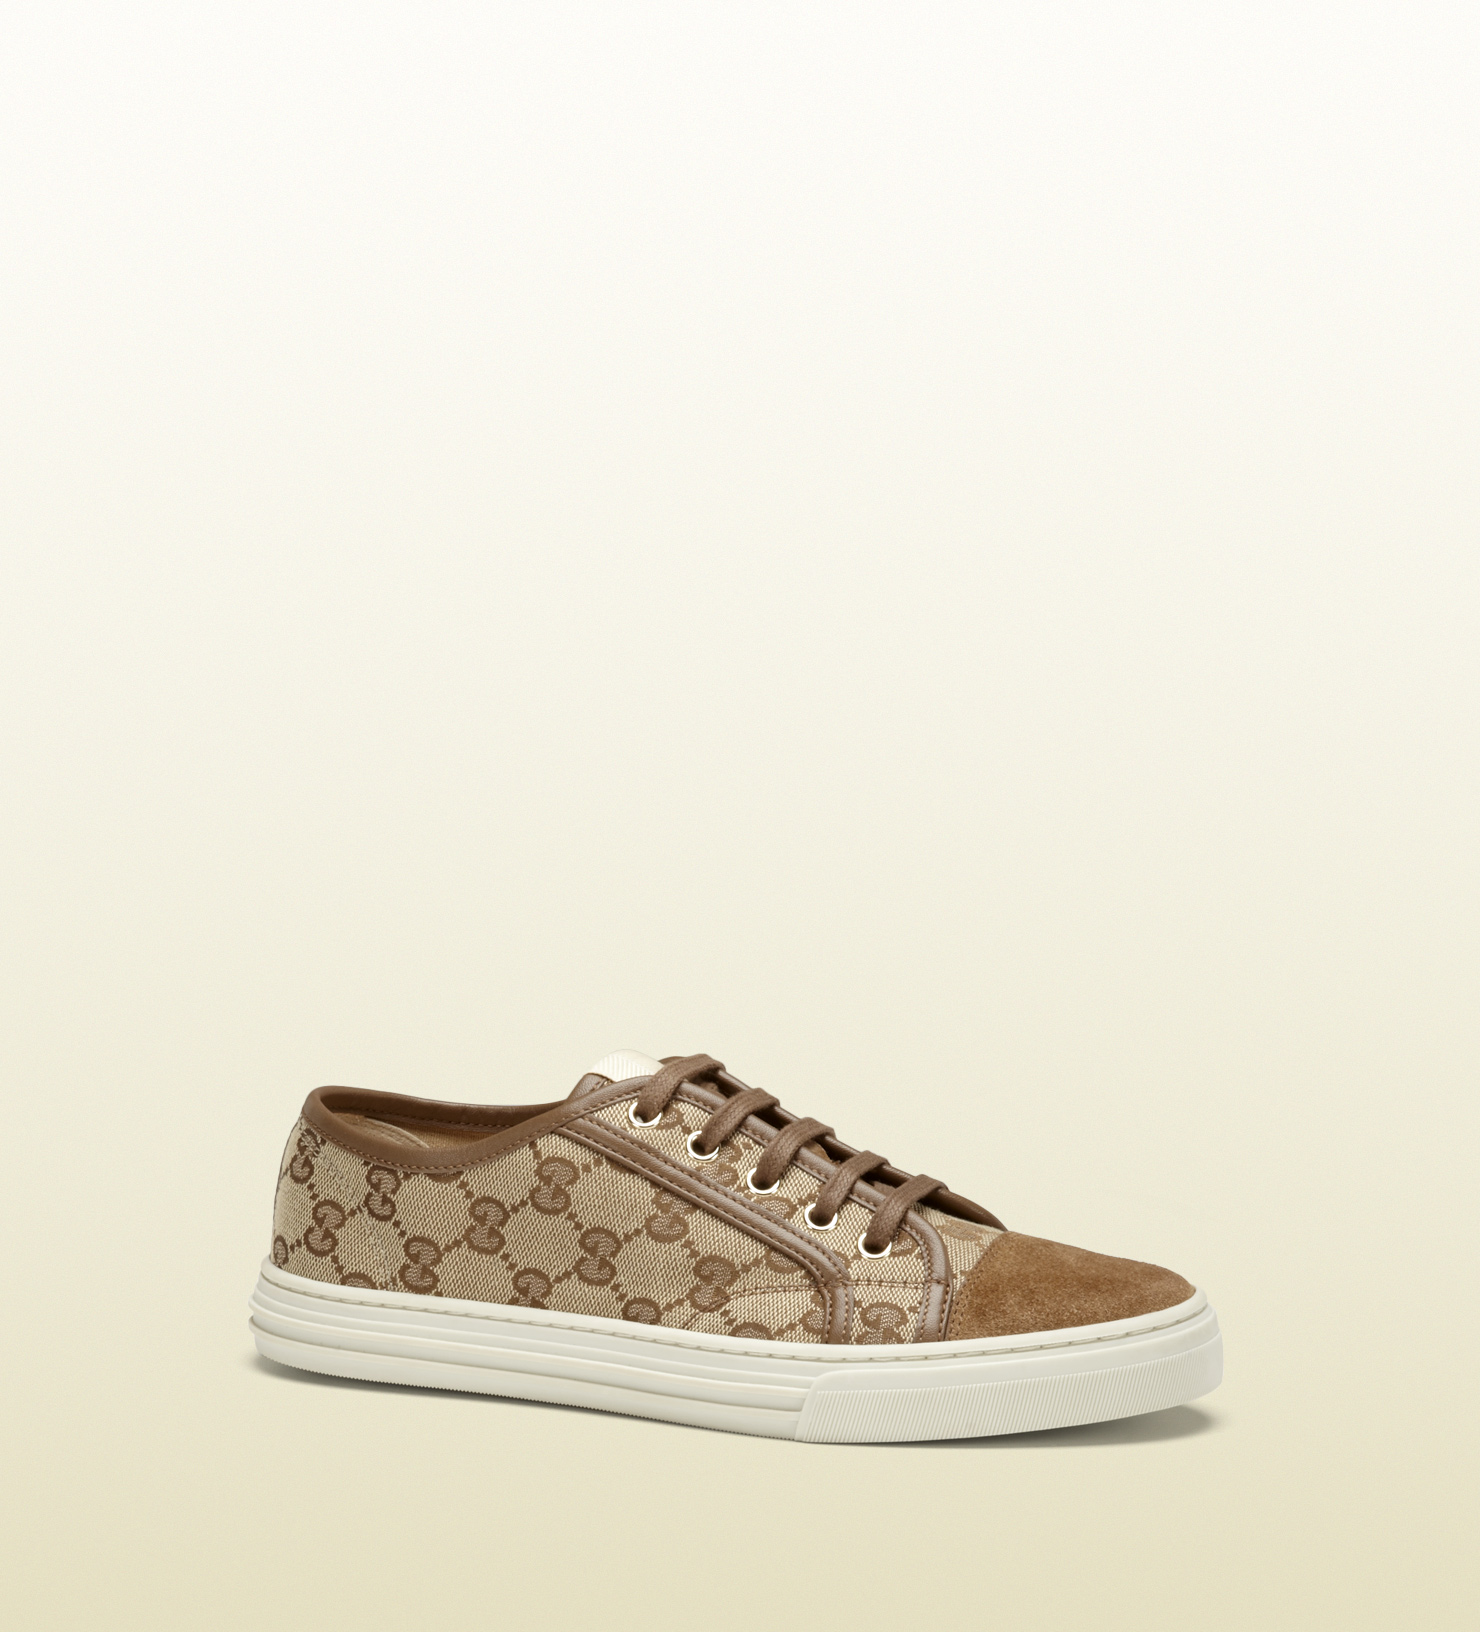 3117f6446ed Lyst - Gucci California Original Gg Canvas Low-top Sneaker in Natural